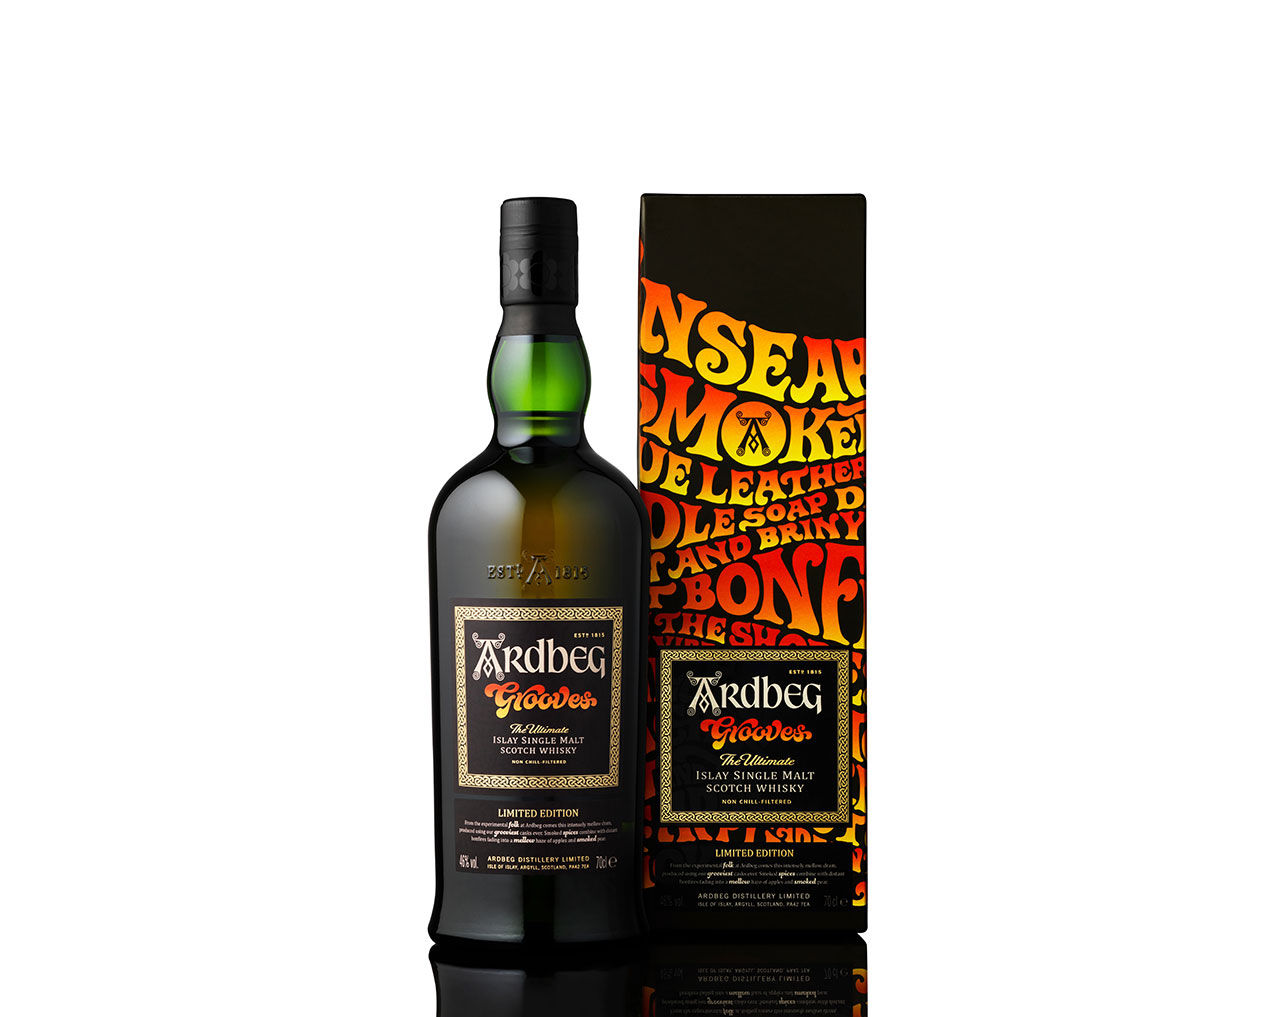 Ardbeg lanserar häftig whisky